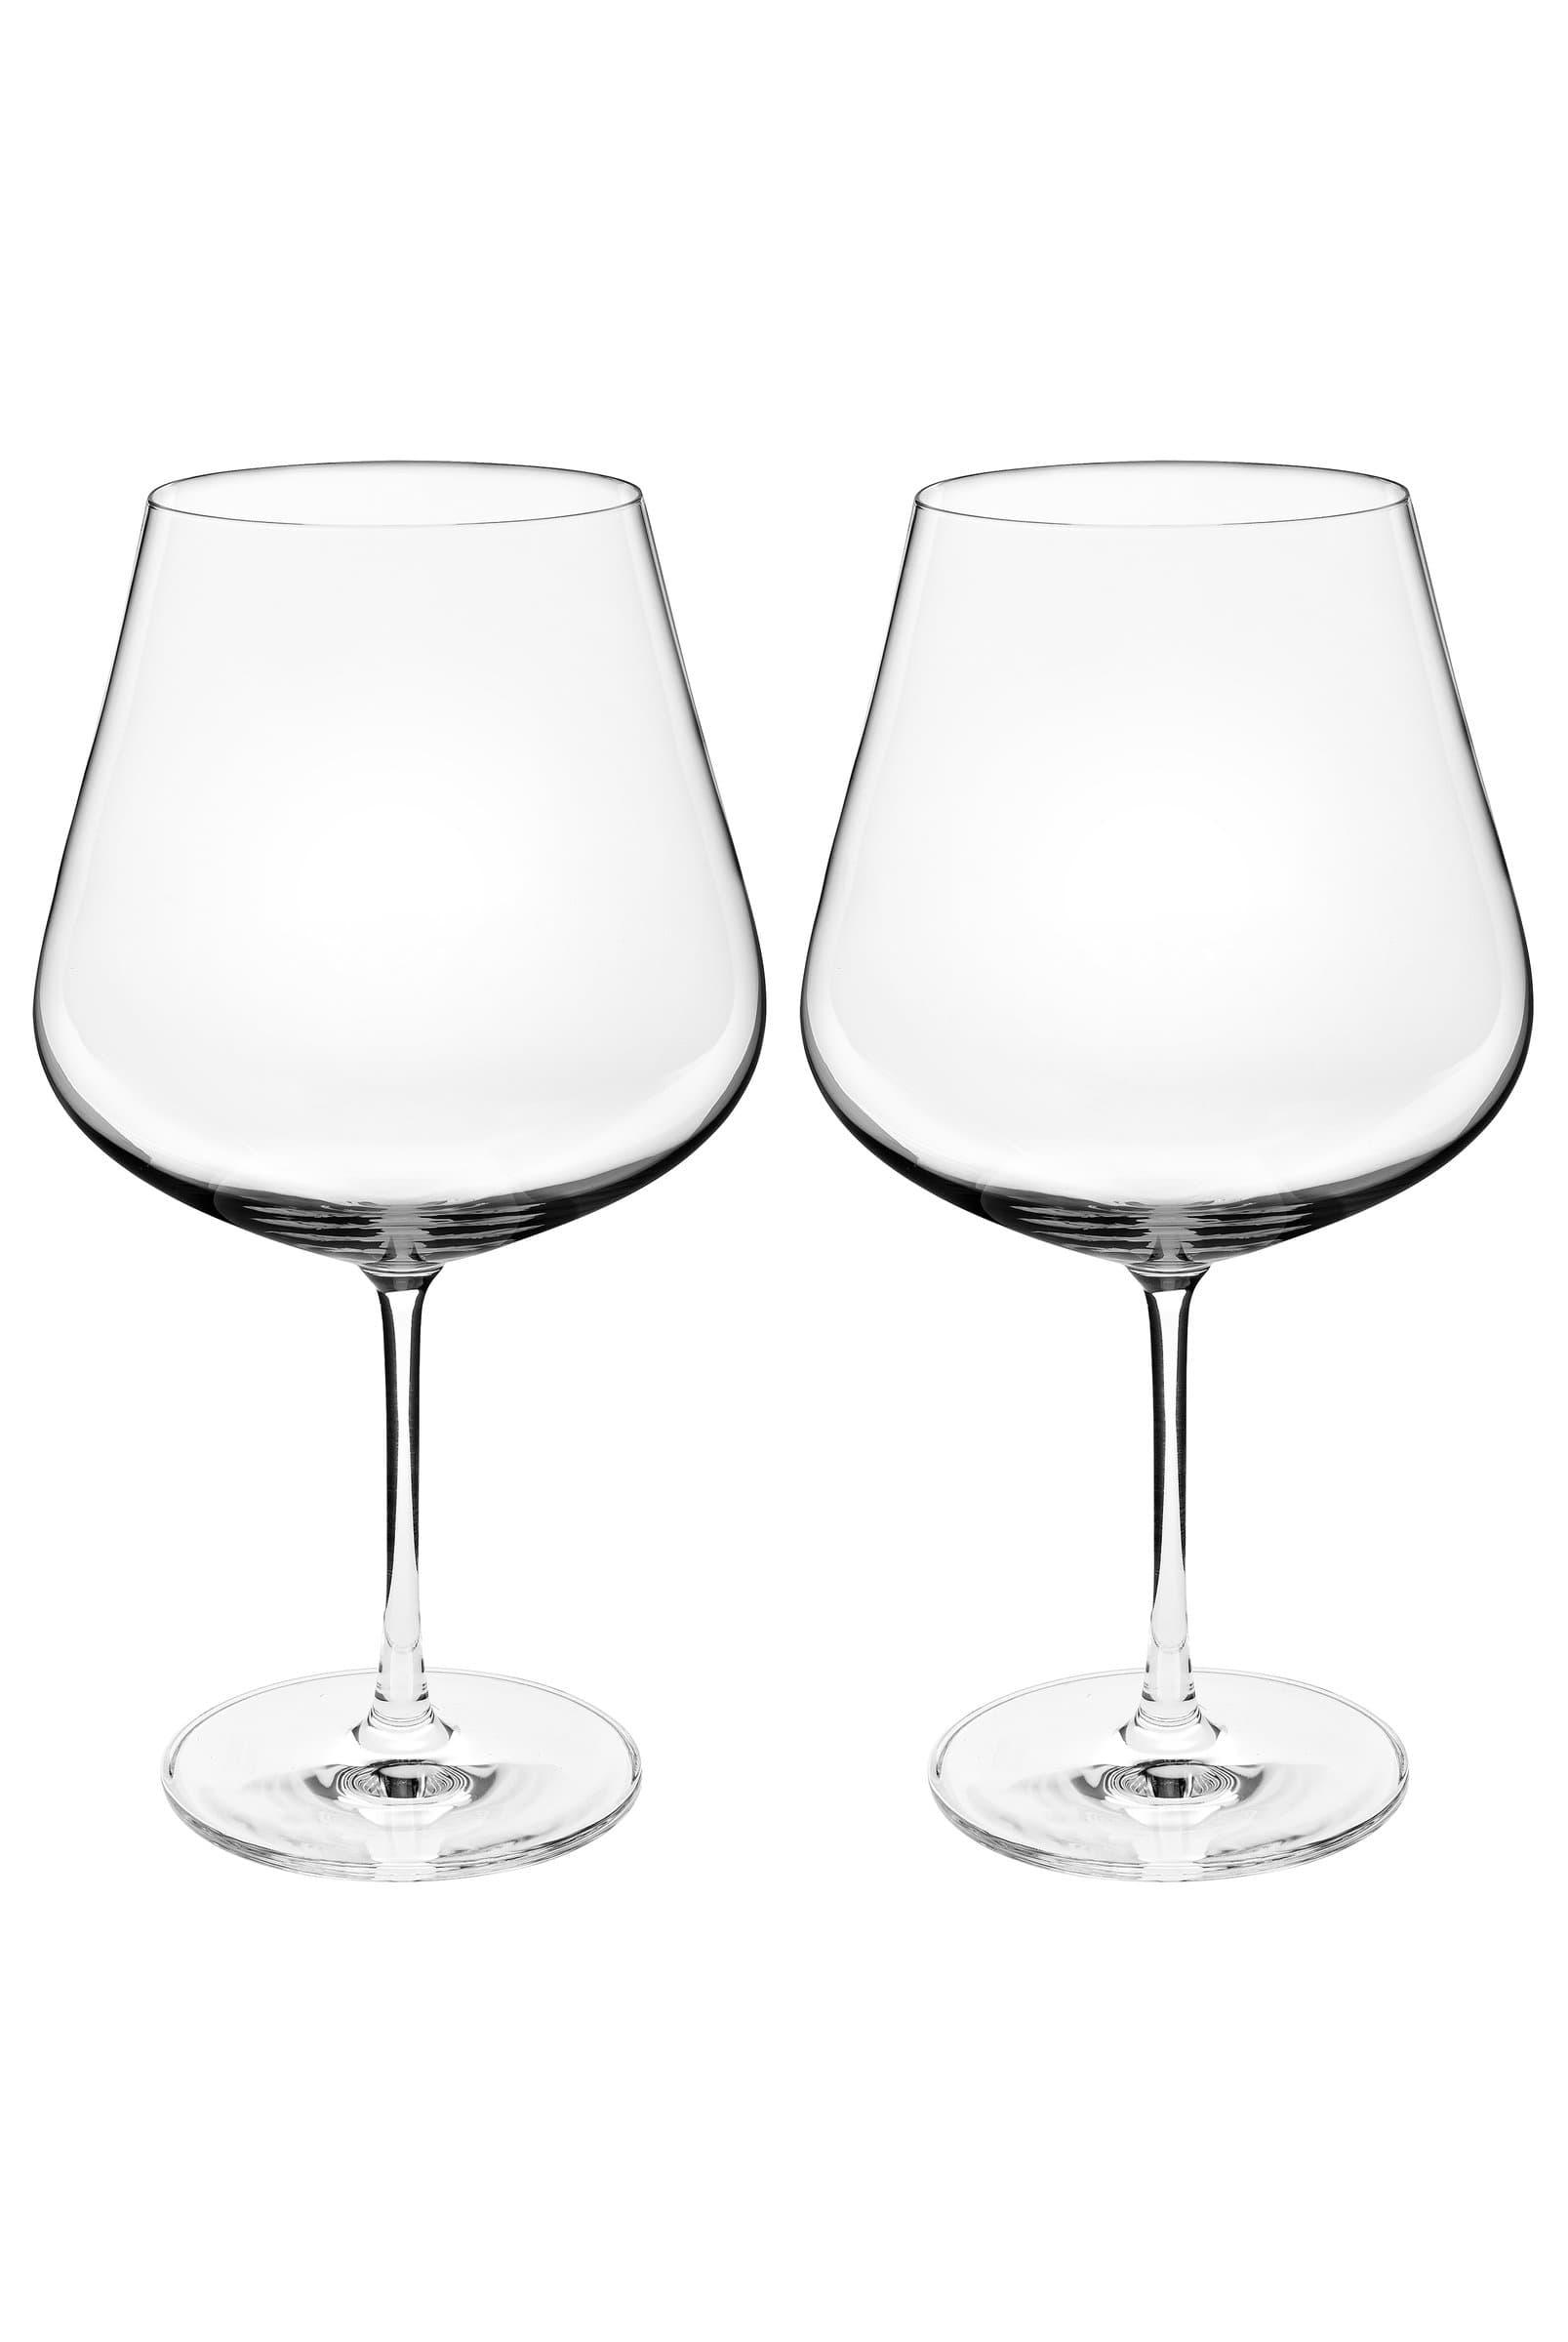 Cucina & Tavola AIR Bourgogne